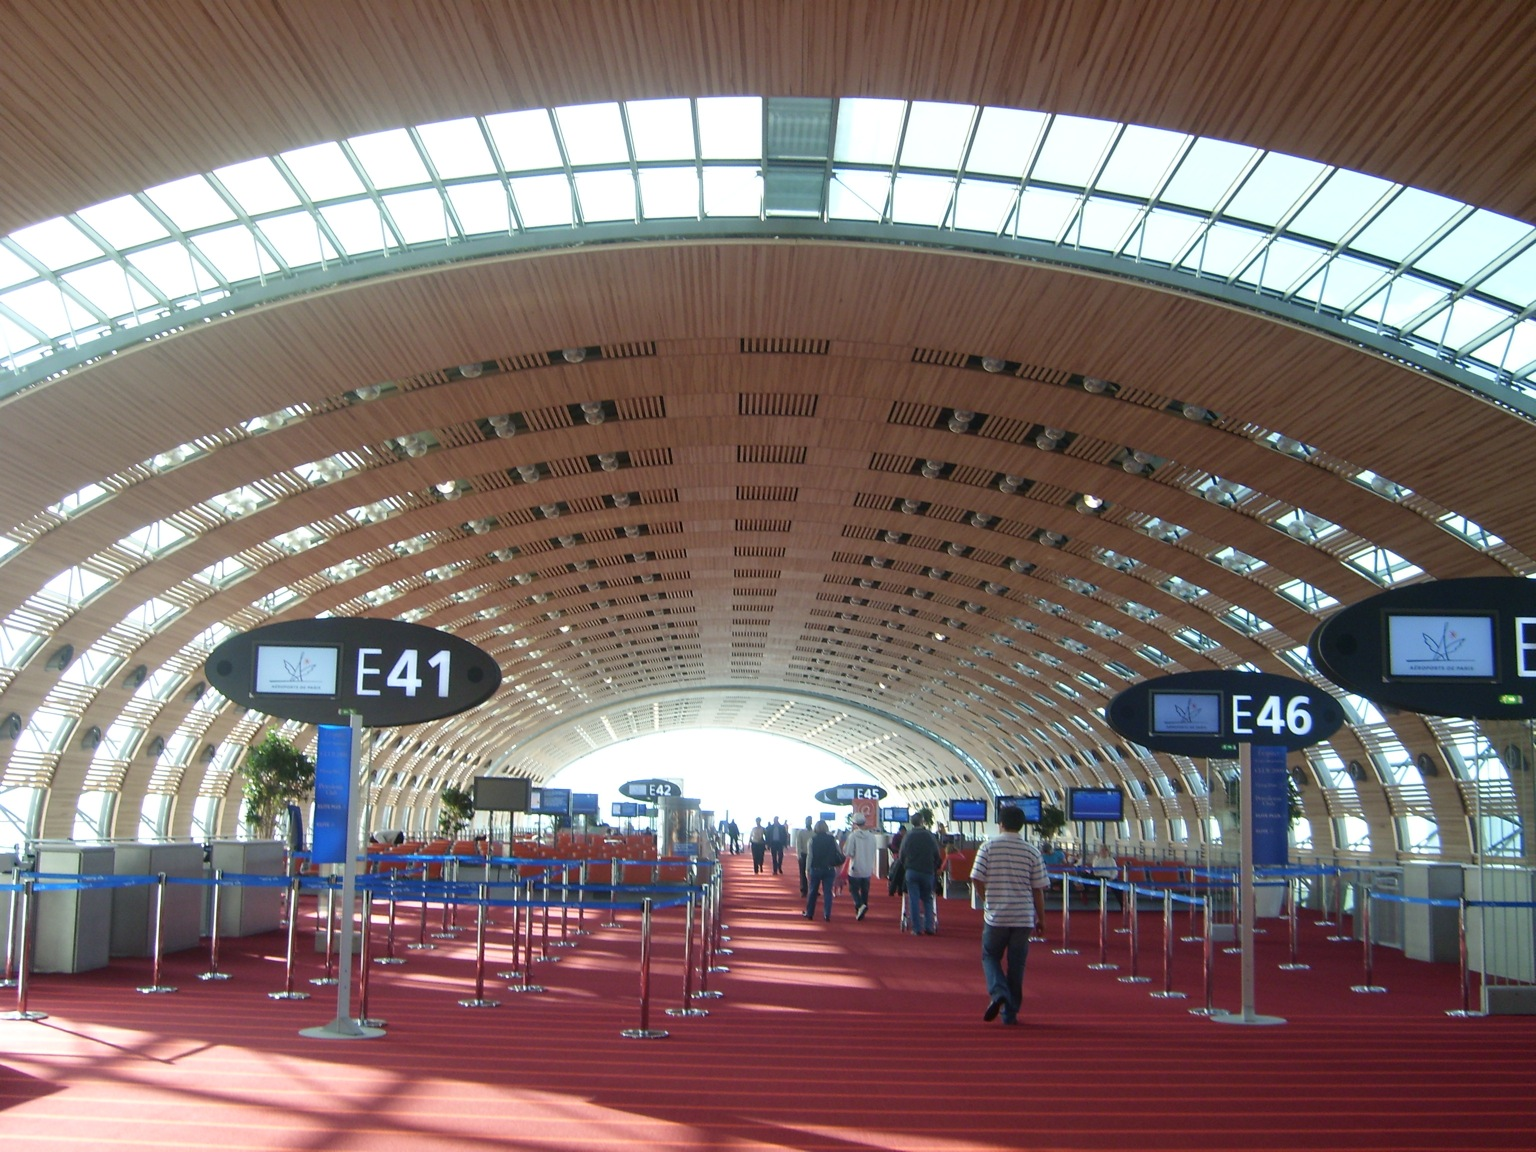 http://2.bp.blogspot.com/_ONal_hJsPR8/TEyFOG9XOtI/AAAAAAAACrw/n2lOobytlAw/s1600/Paris_Charles_De_Gaulle_Airport_Terminal_E_a.JPG